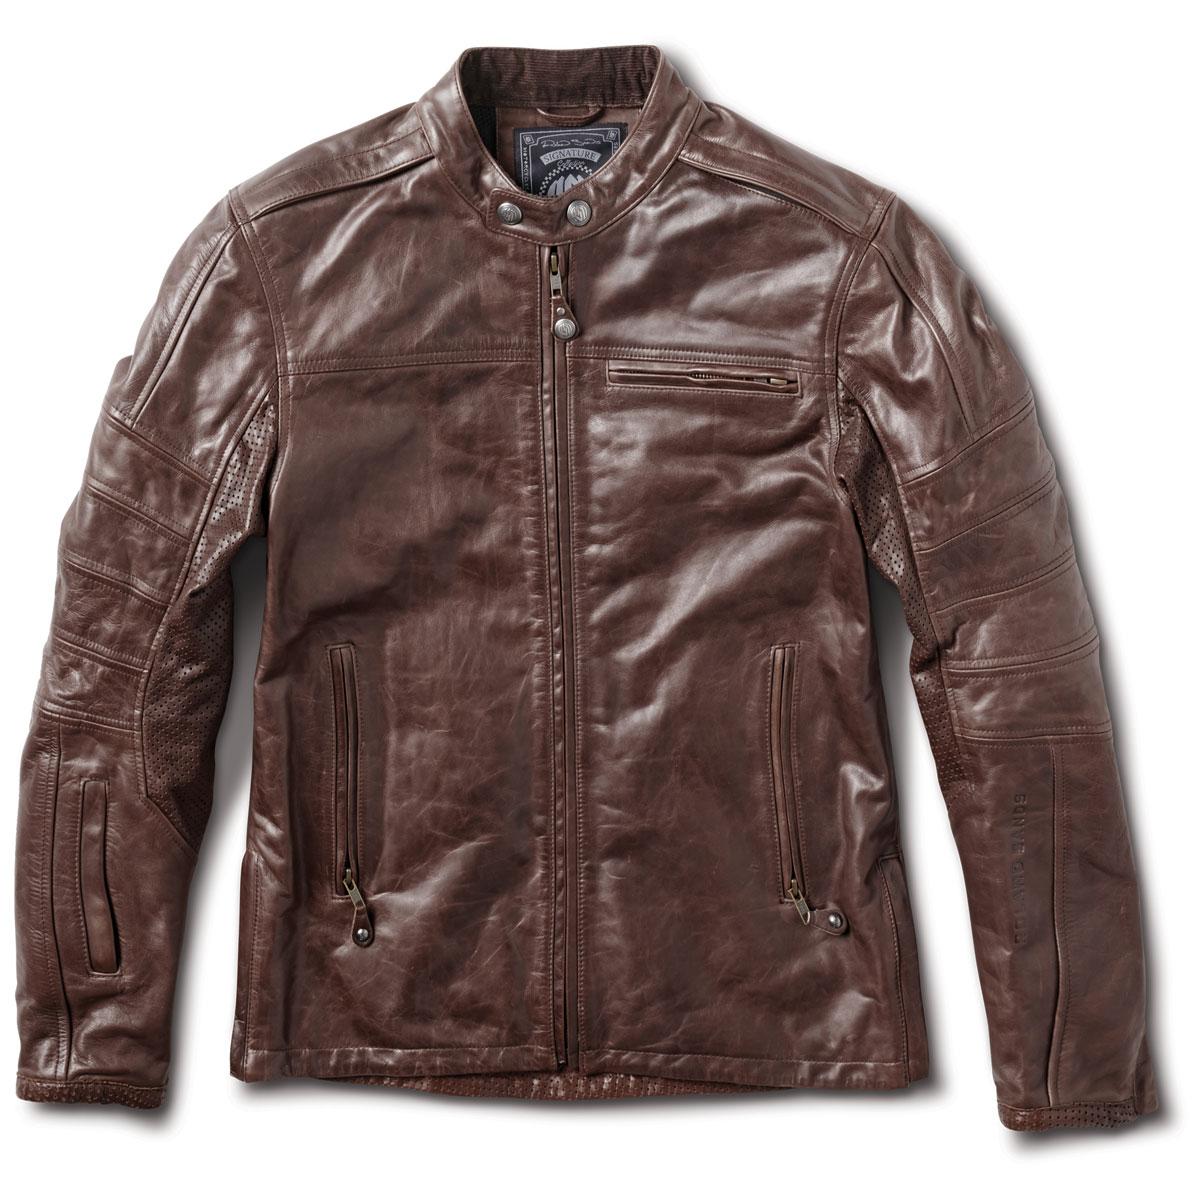 597542b42 Roland Sands Design Apparel Men's Ronin RS Signature Tobacco Leather Jacket  - RD8745